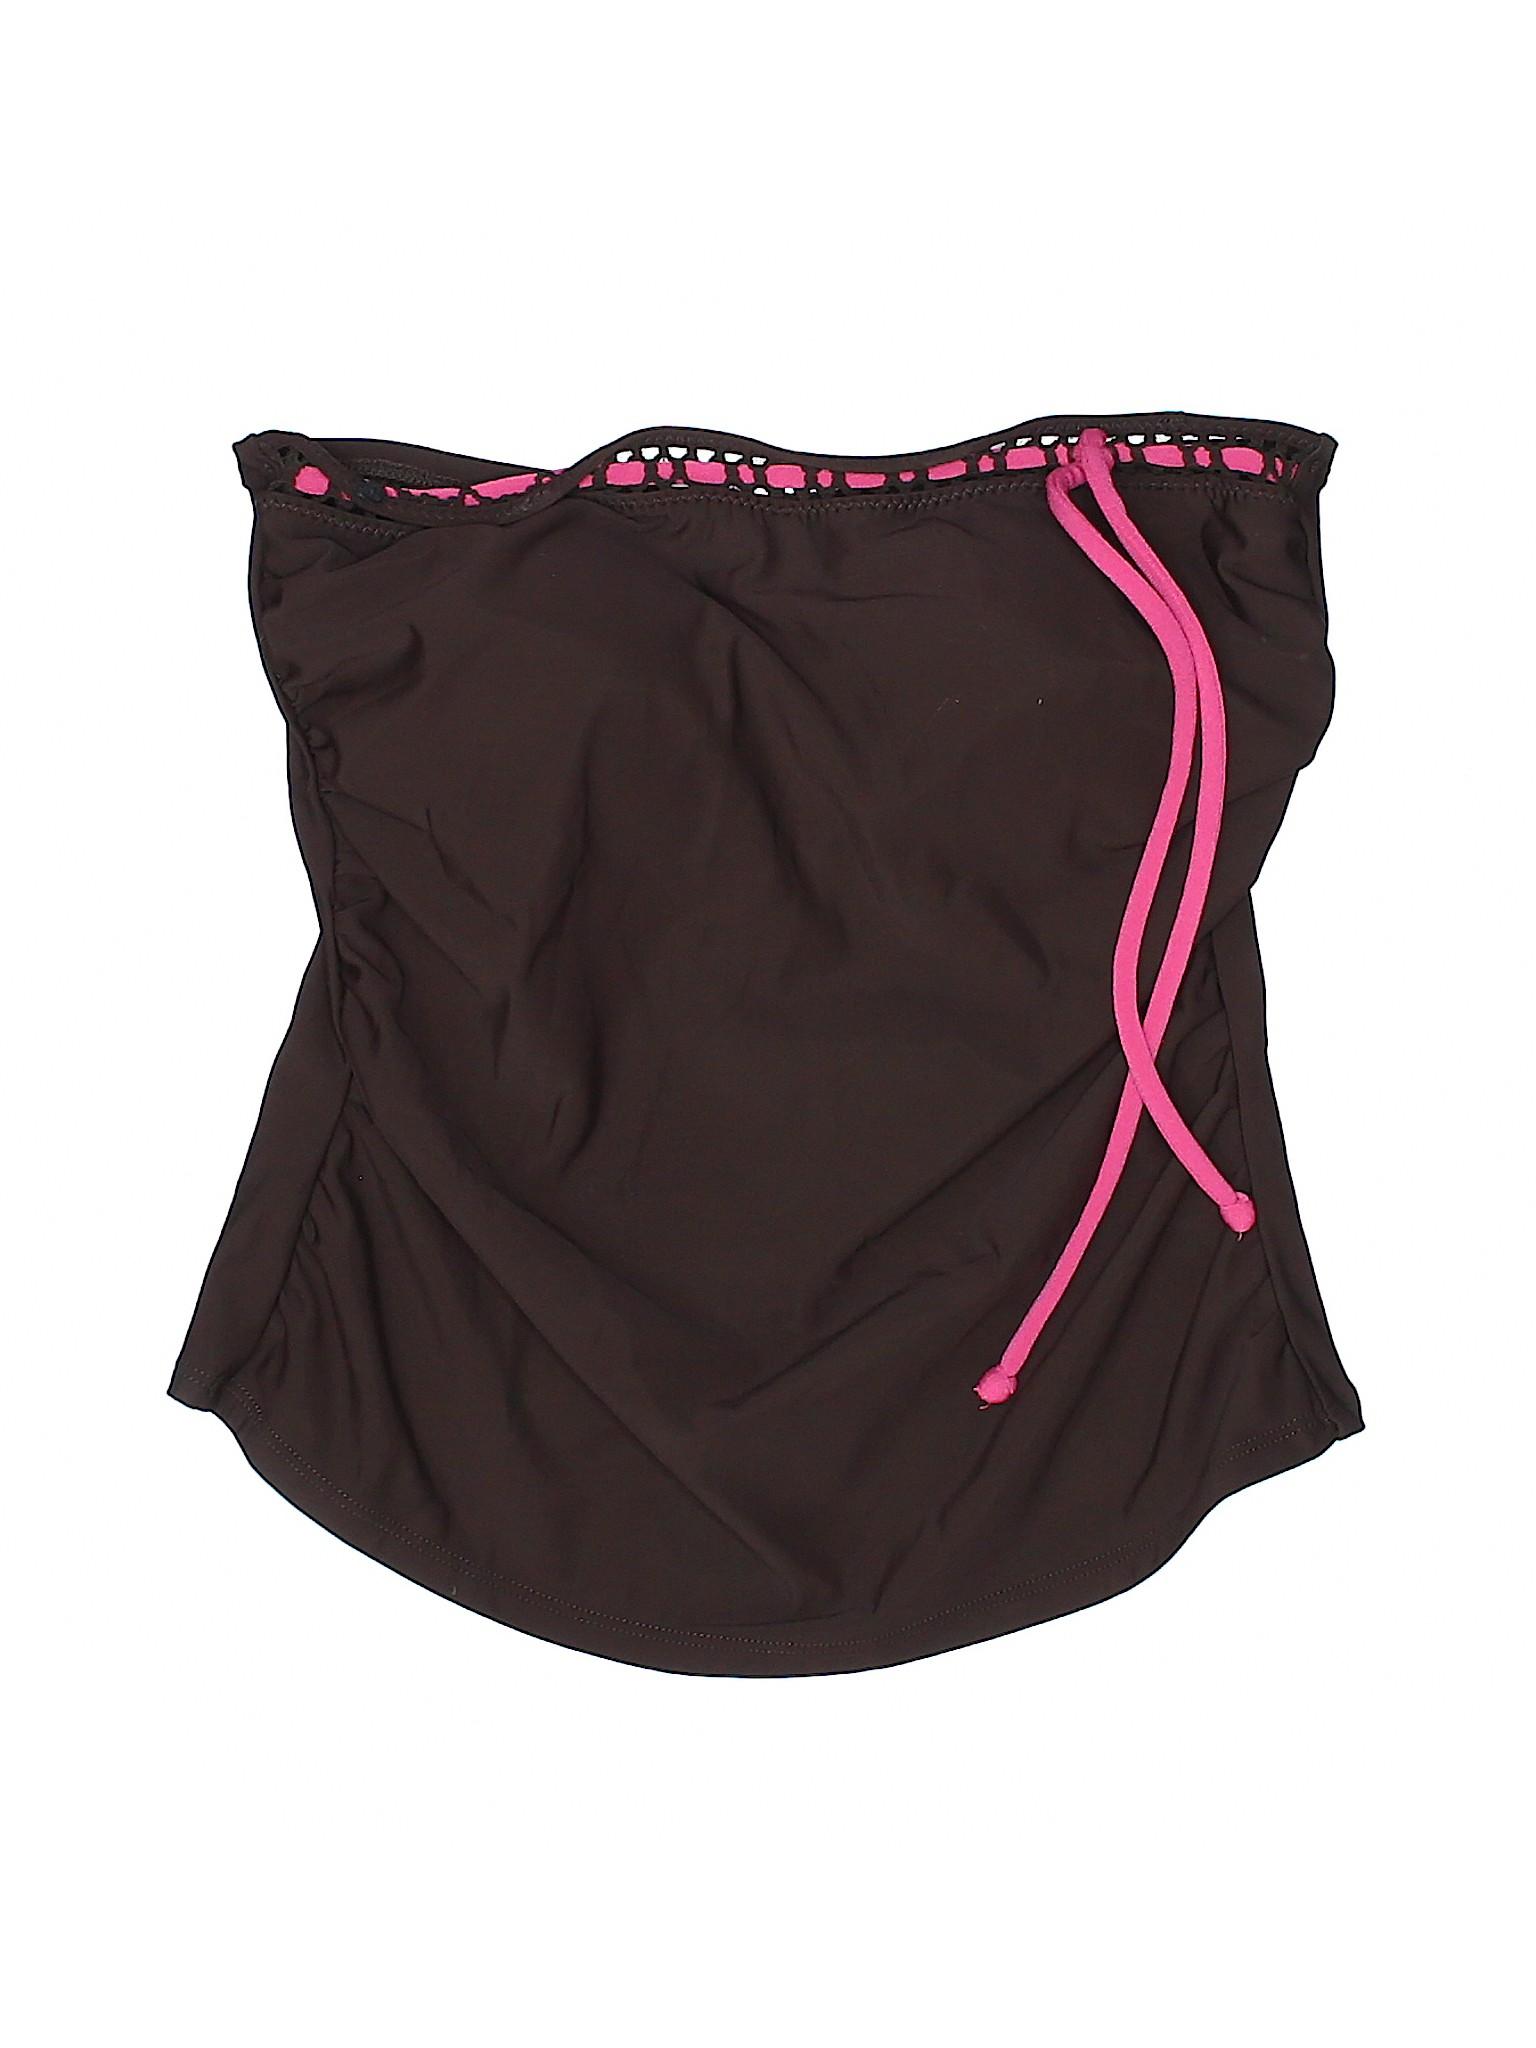 Boutique Robin Boutique Piccone Top Swimsuit Swimsuit Top Piccone Robin Iq4qwFxC